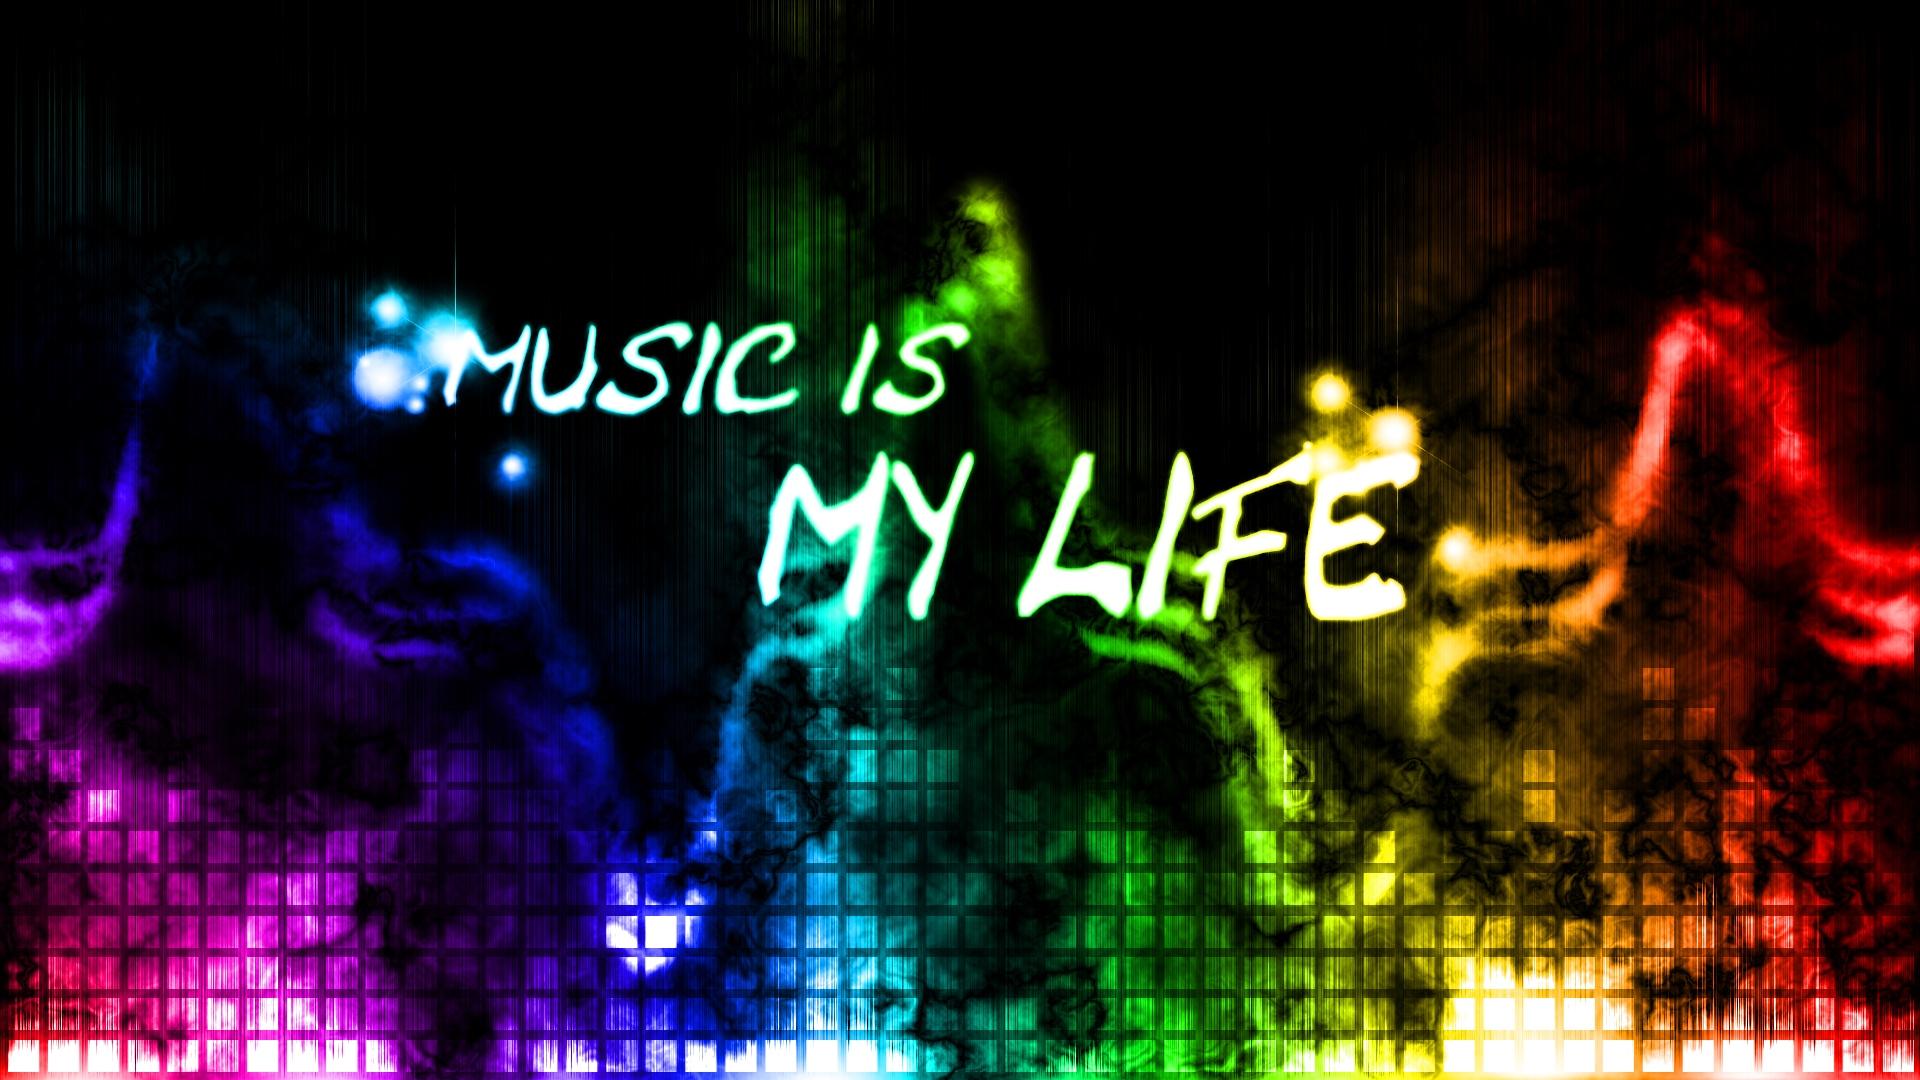 Music Is Life Hd - HD Wallpaper